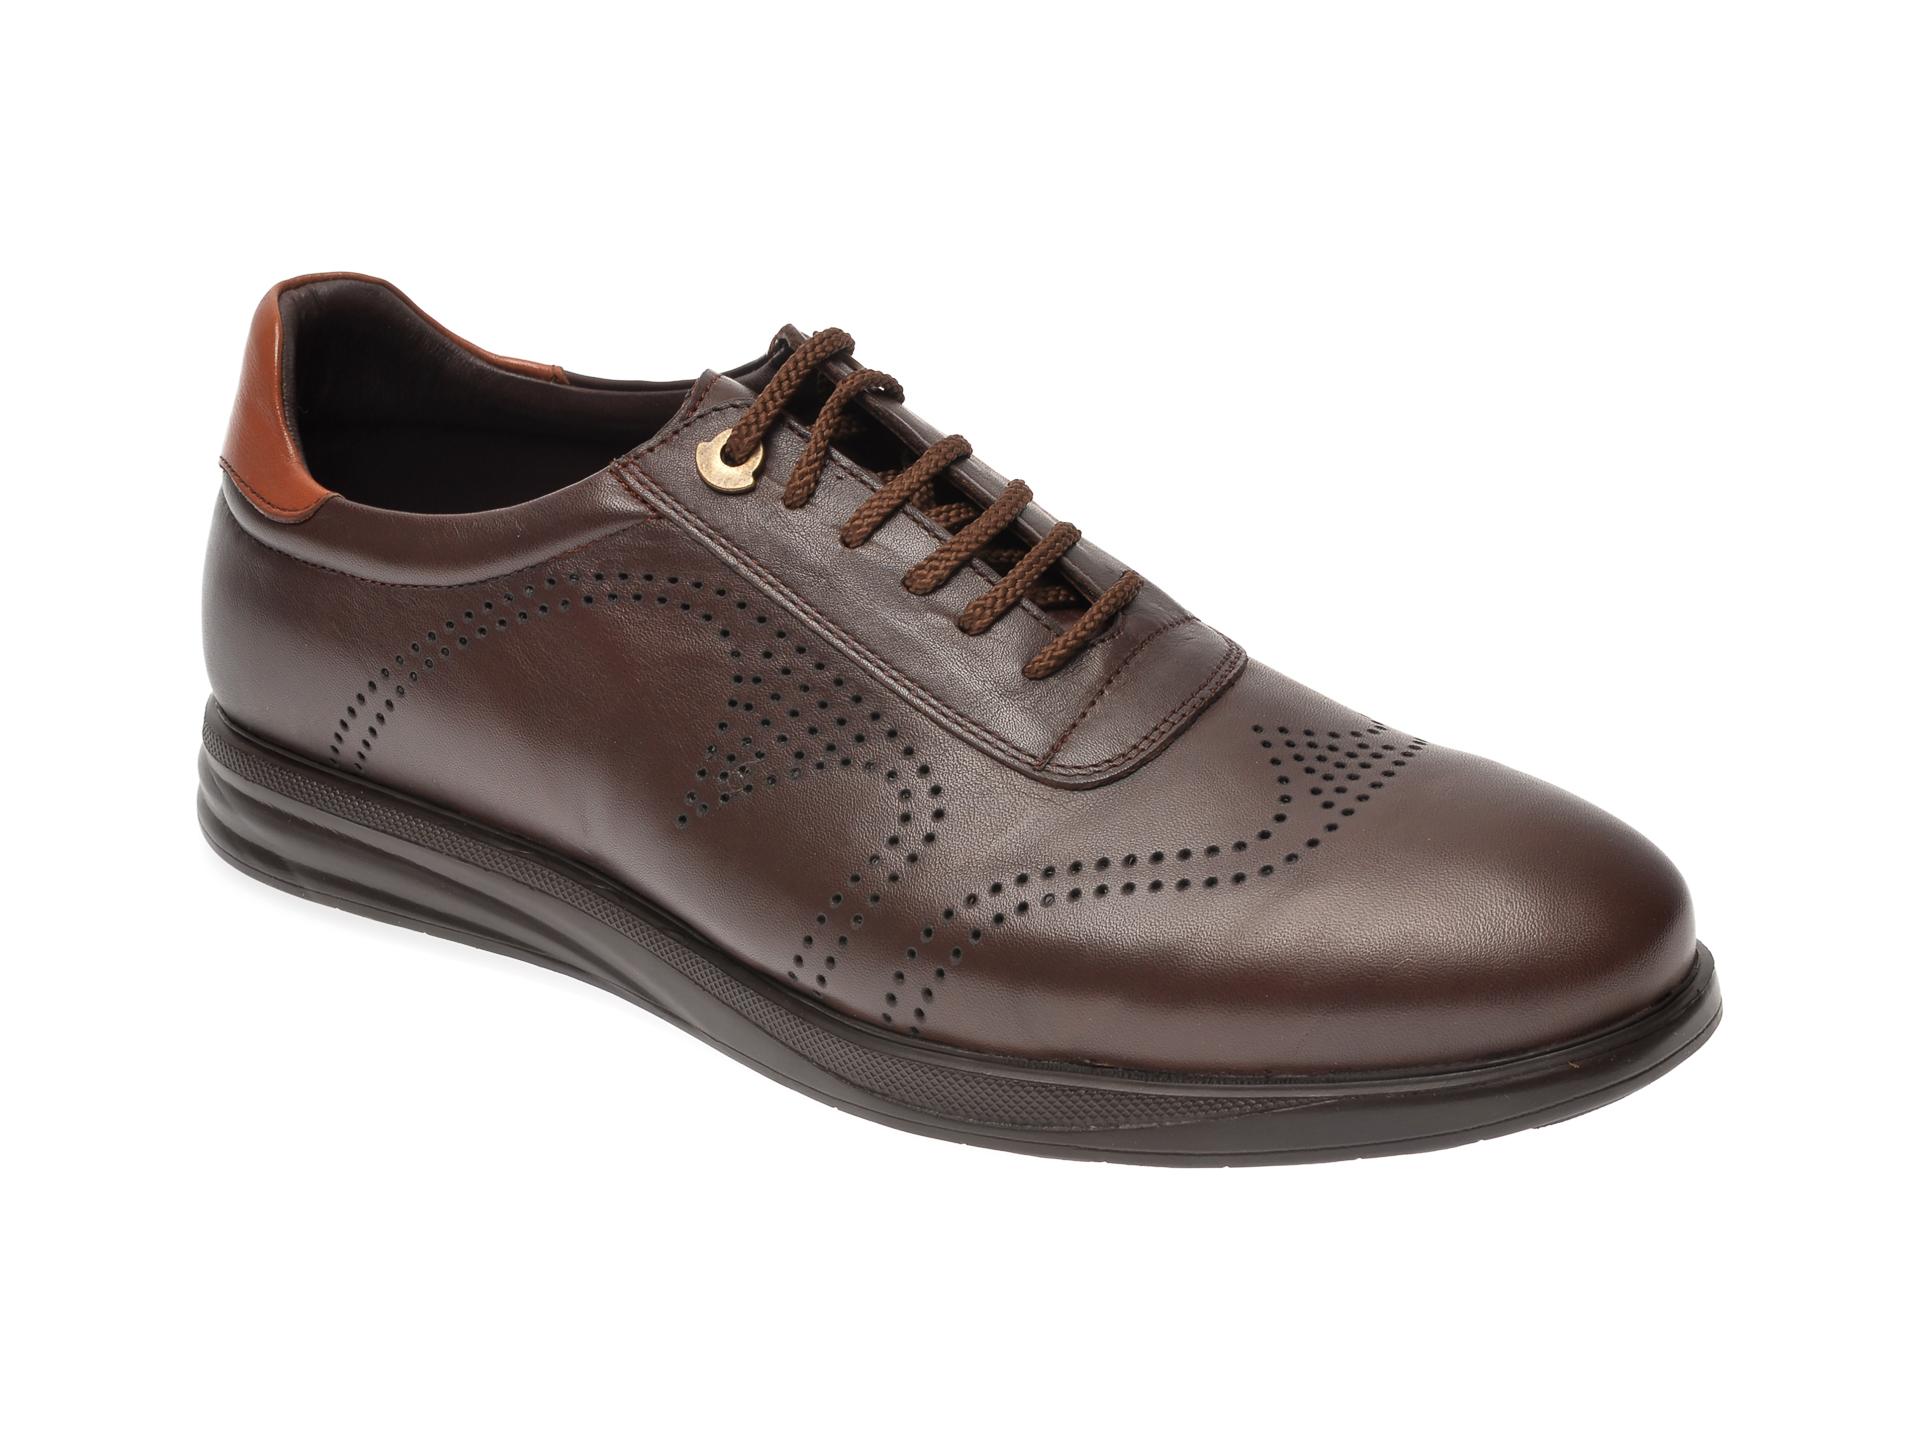 Pantofi OTTER maro, E881, din piele naturala imagine